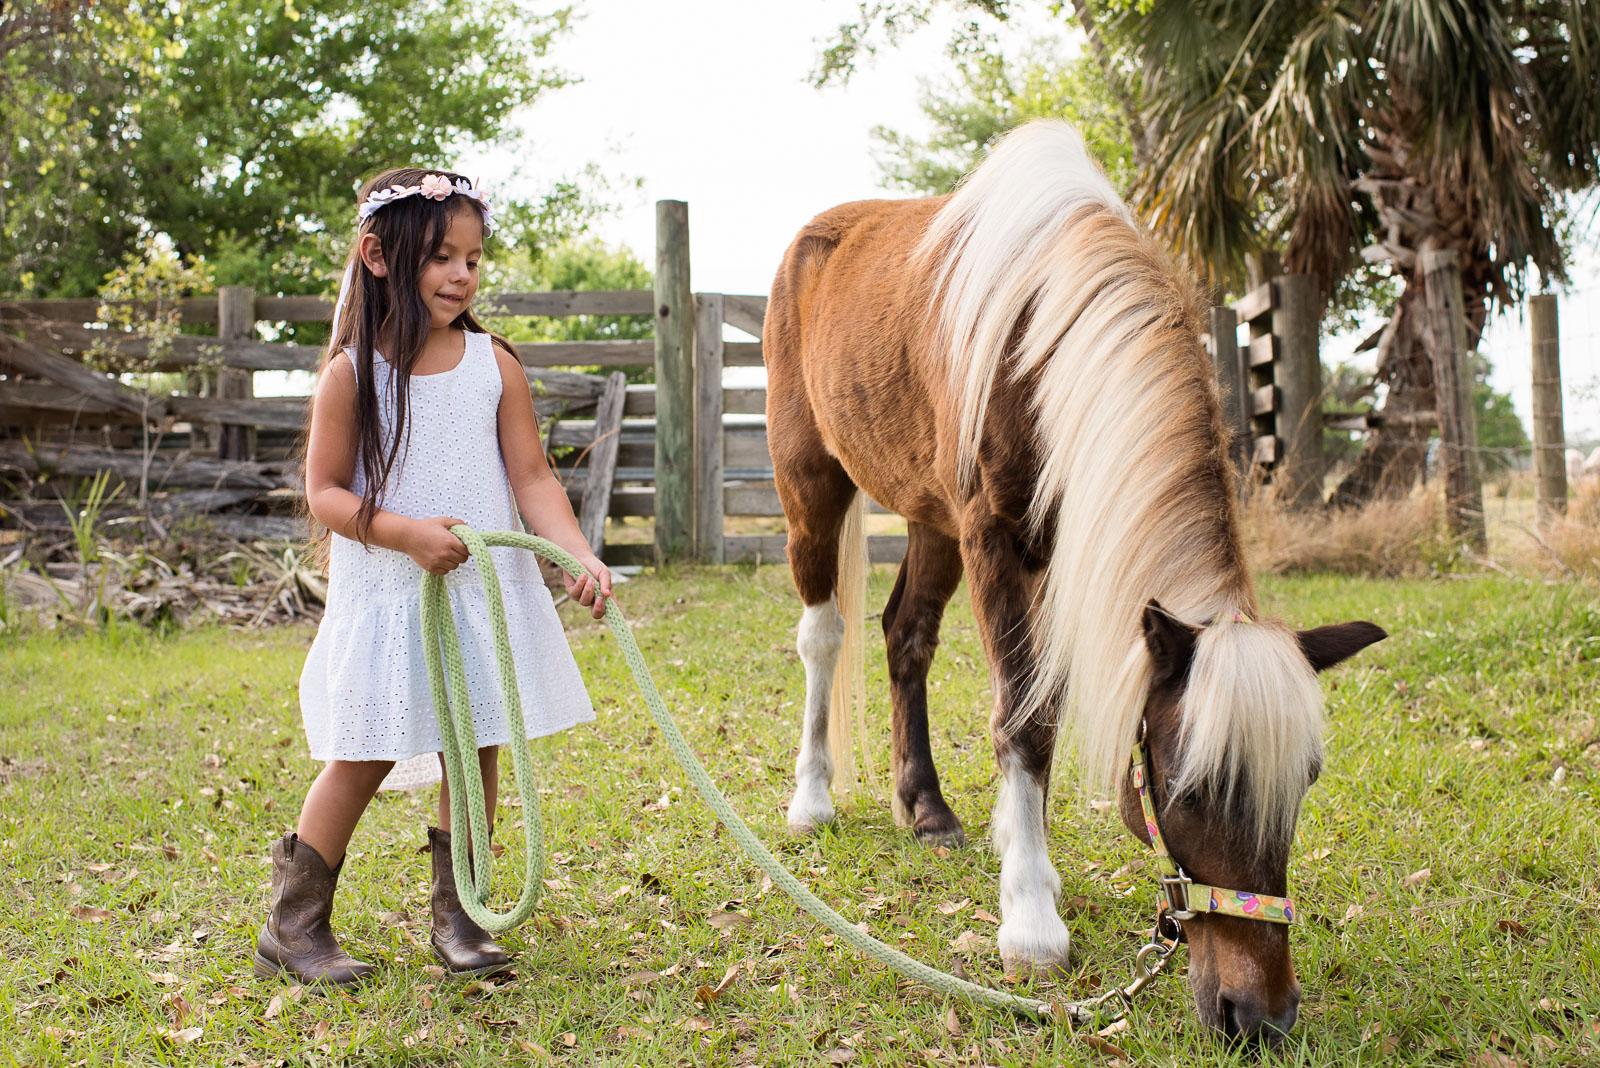 photo-sessions-children-horse-01-2.jpg